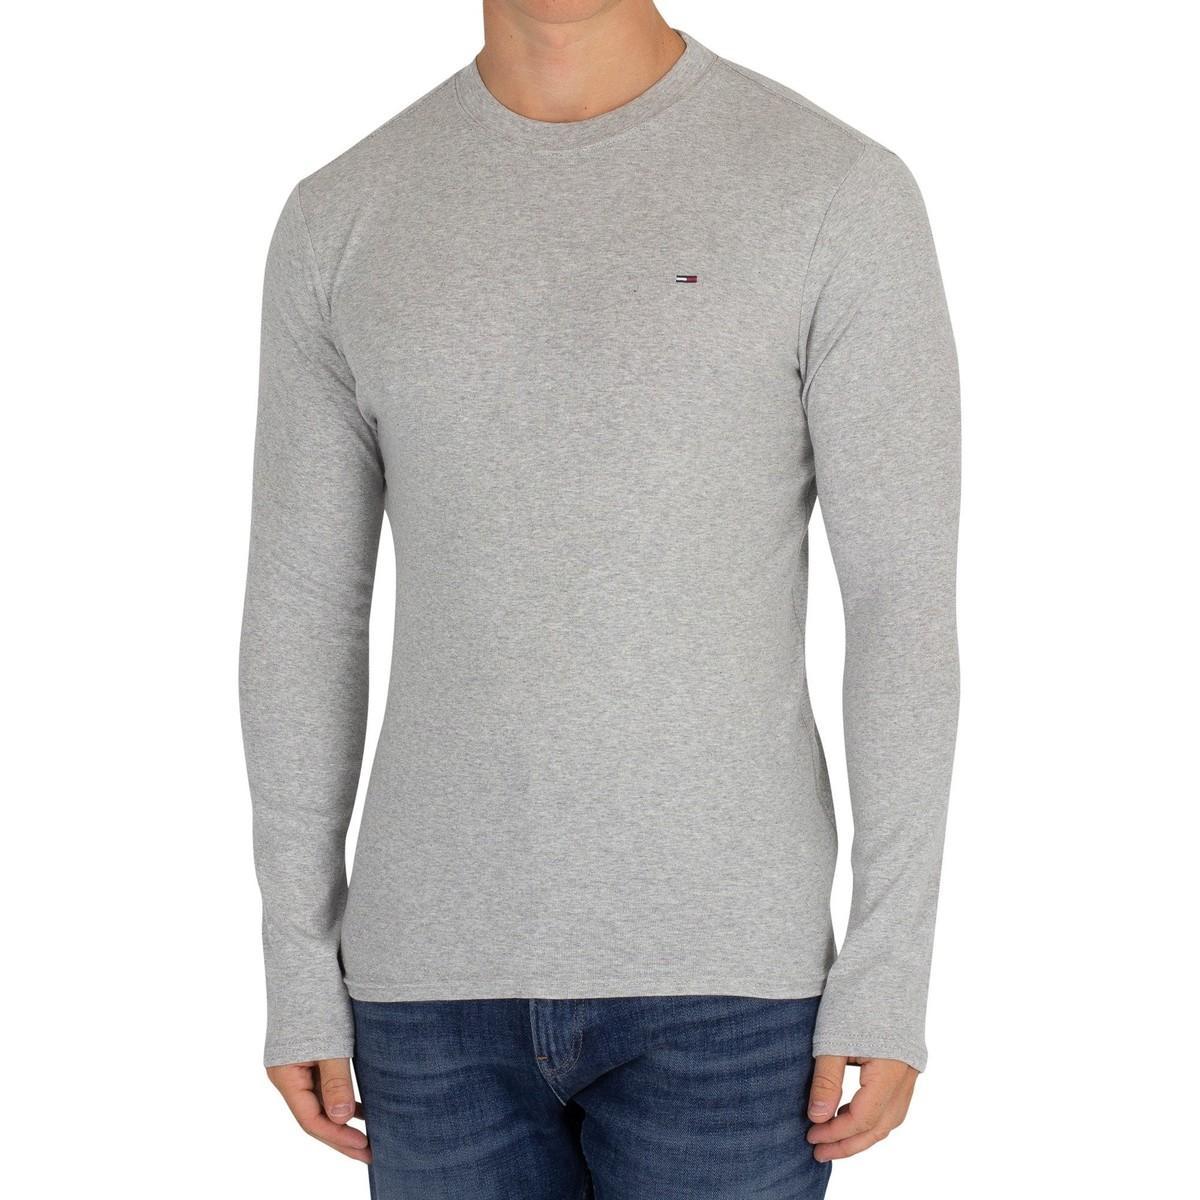 da172670 Tommy Hilfiger - Gray Men's Slim Rib Longsleeved T-shirt, Grey Men's  Sweater In. View fullscreen